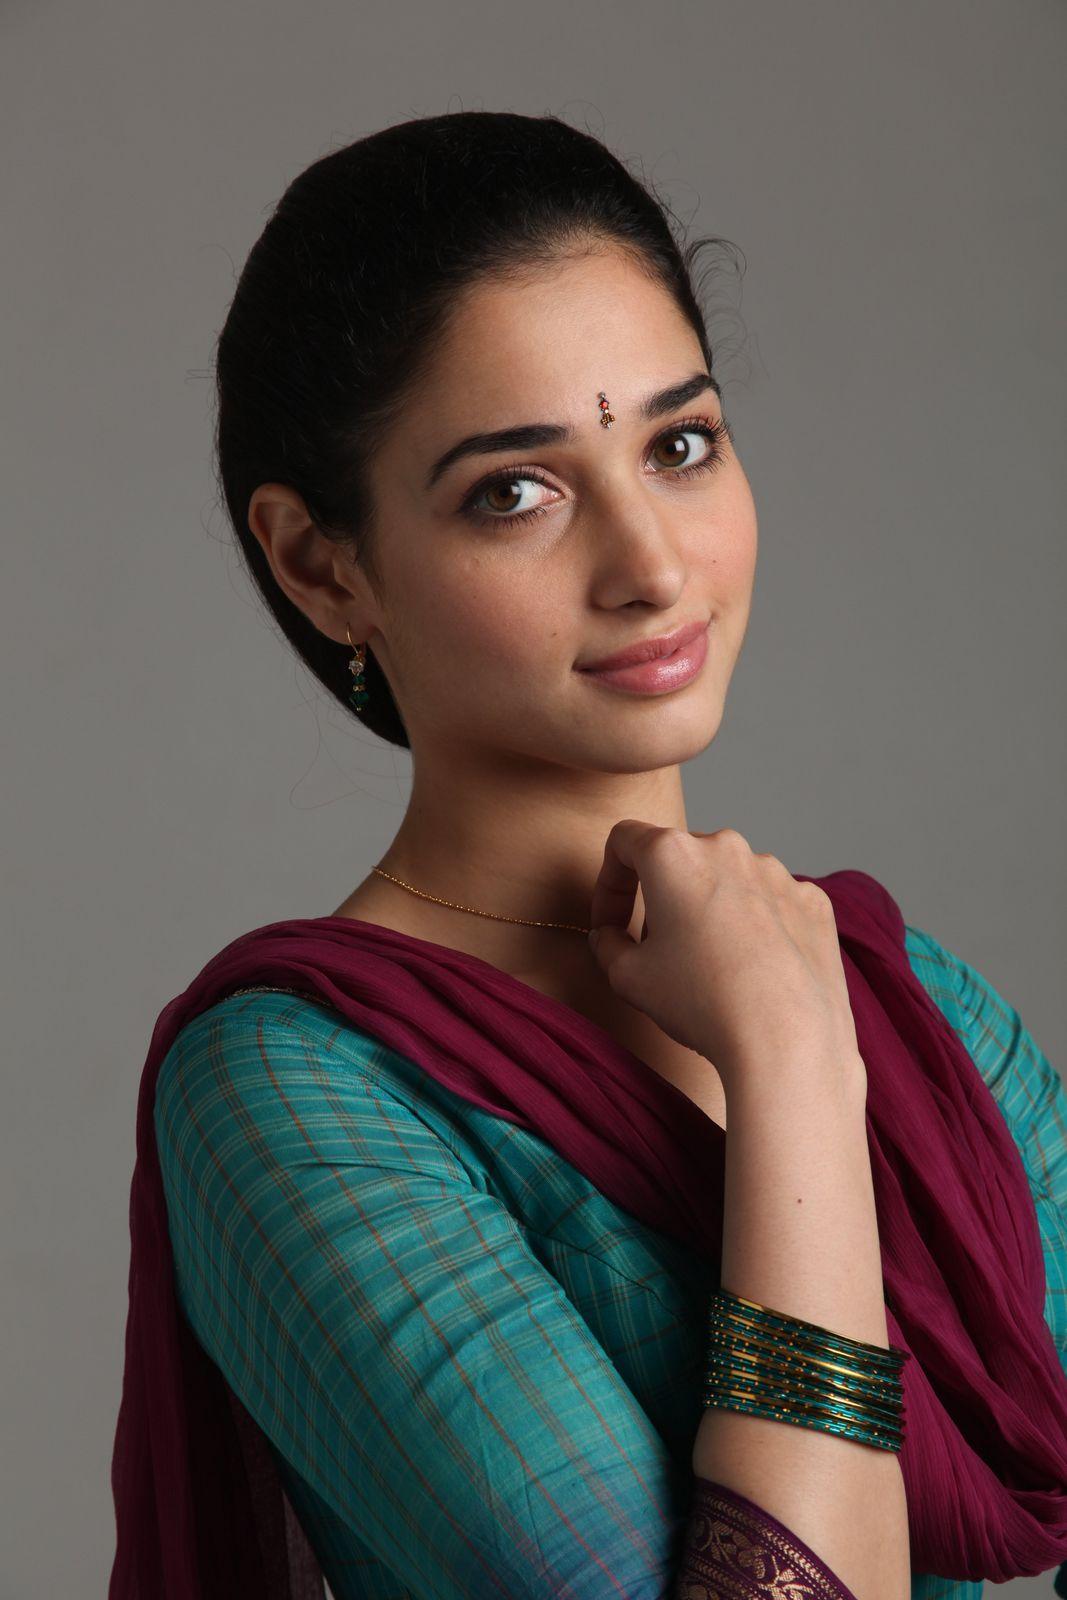 tammanah photos from tamil movie vengai | hot tollywood actress